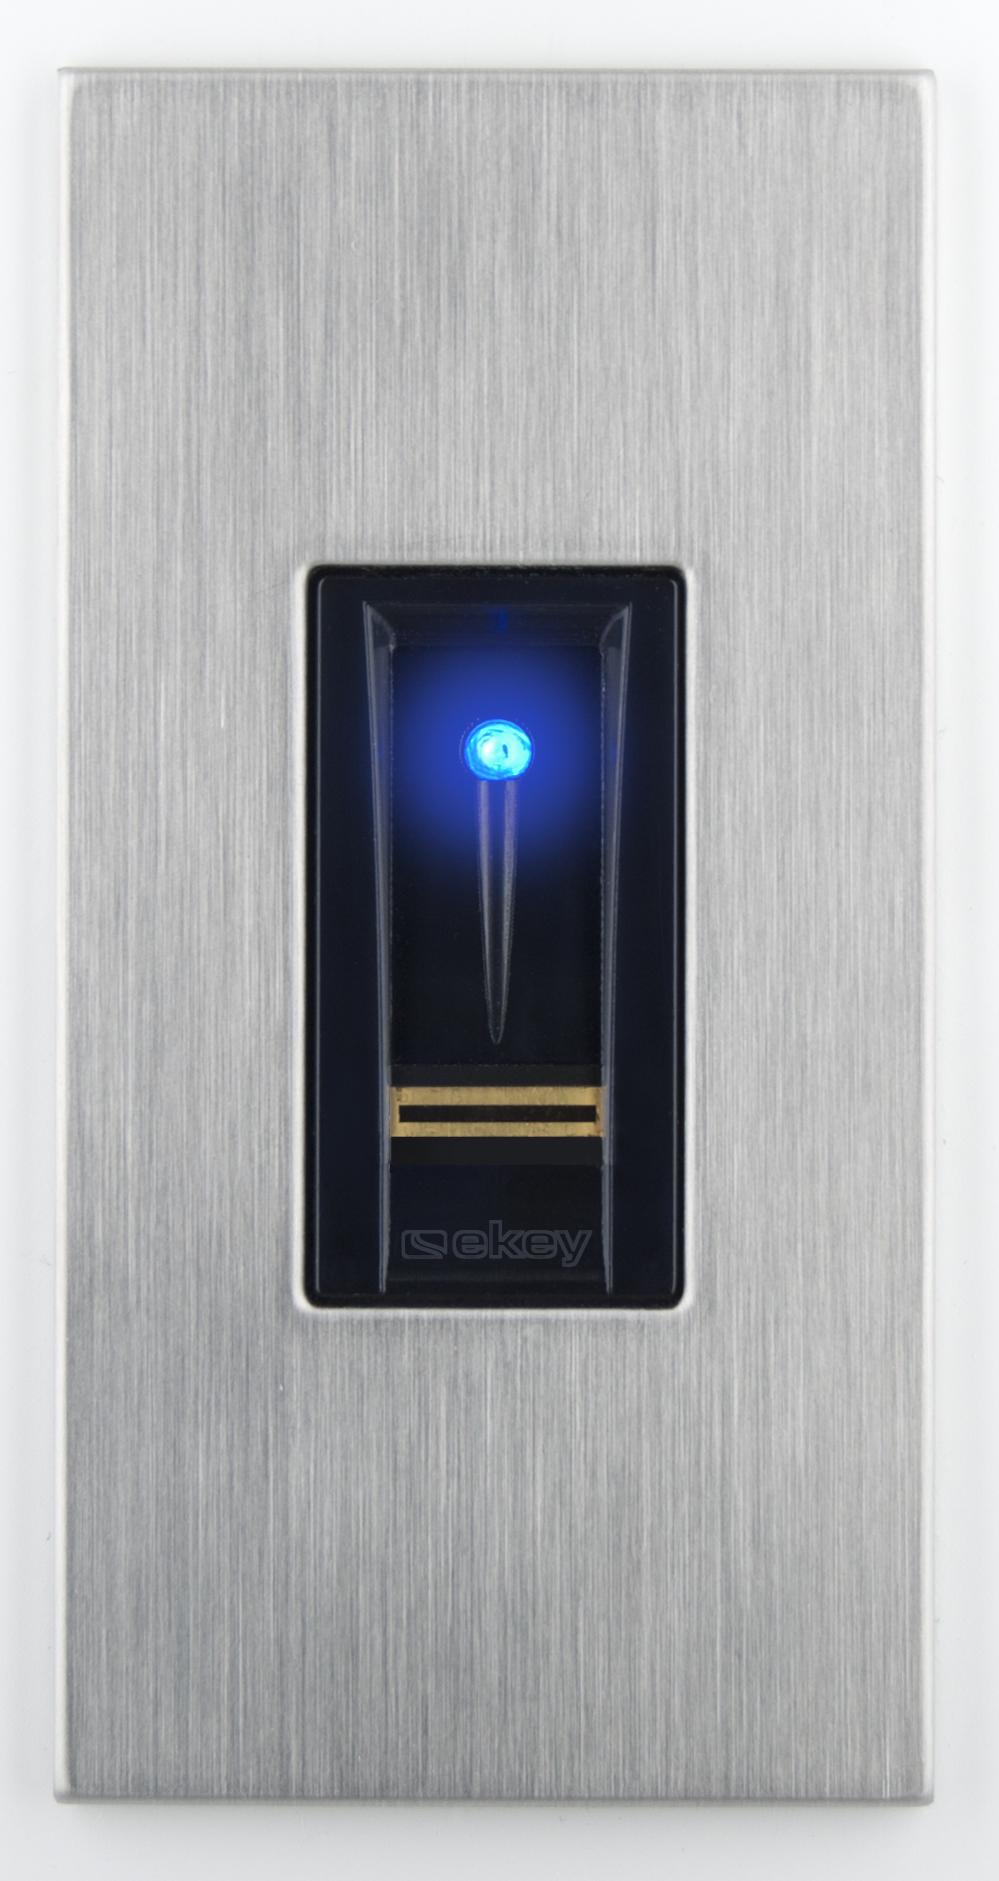 1 Stk ekey home Fingerscanner Integra 2.0 mit Dekor Edelstahl EK101326--